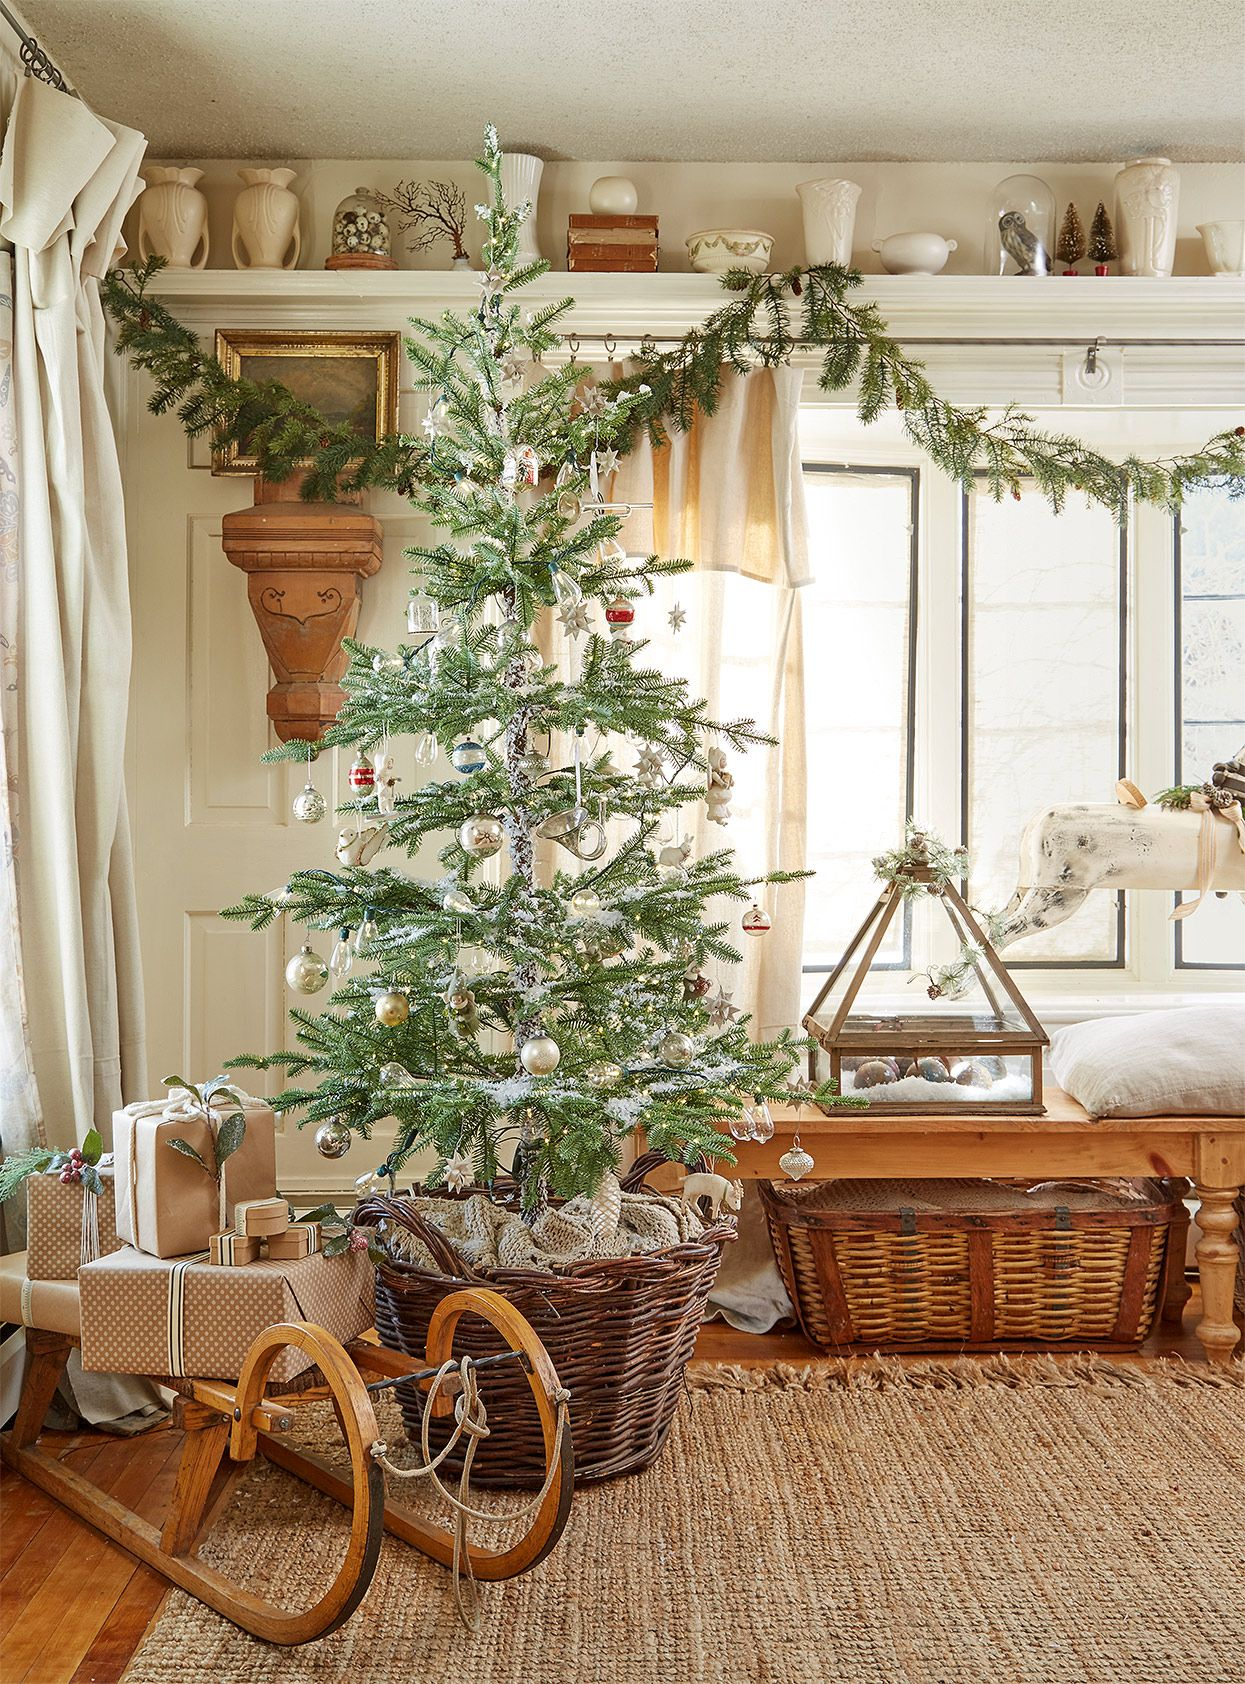 Photo of 19 Farmhouse Christmas Decor Ideas to Make Your Space More Festive